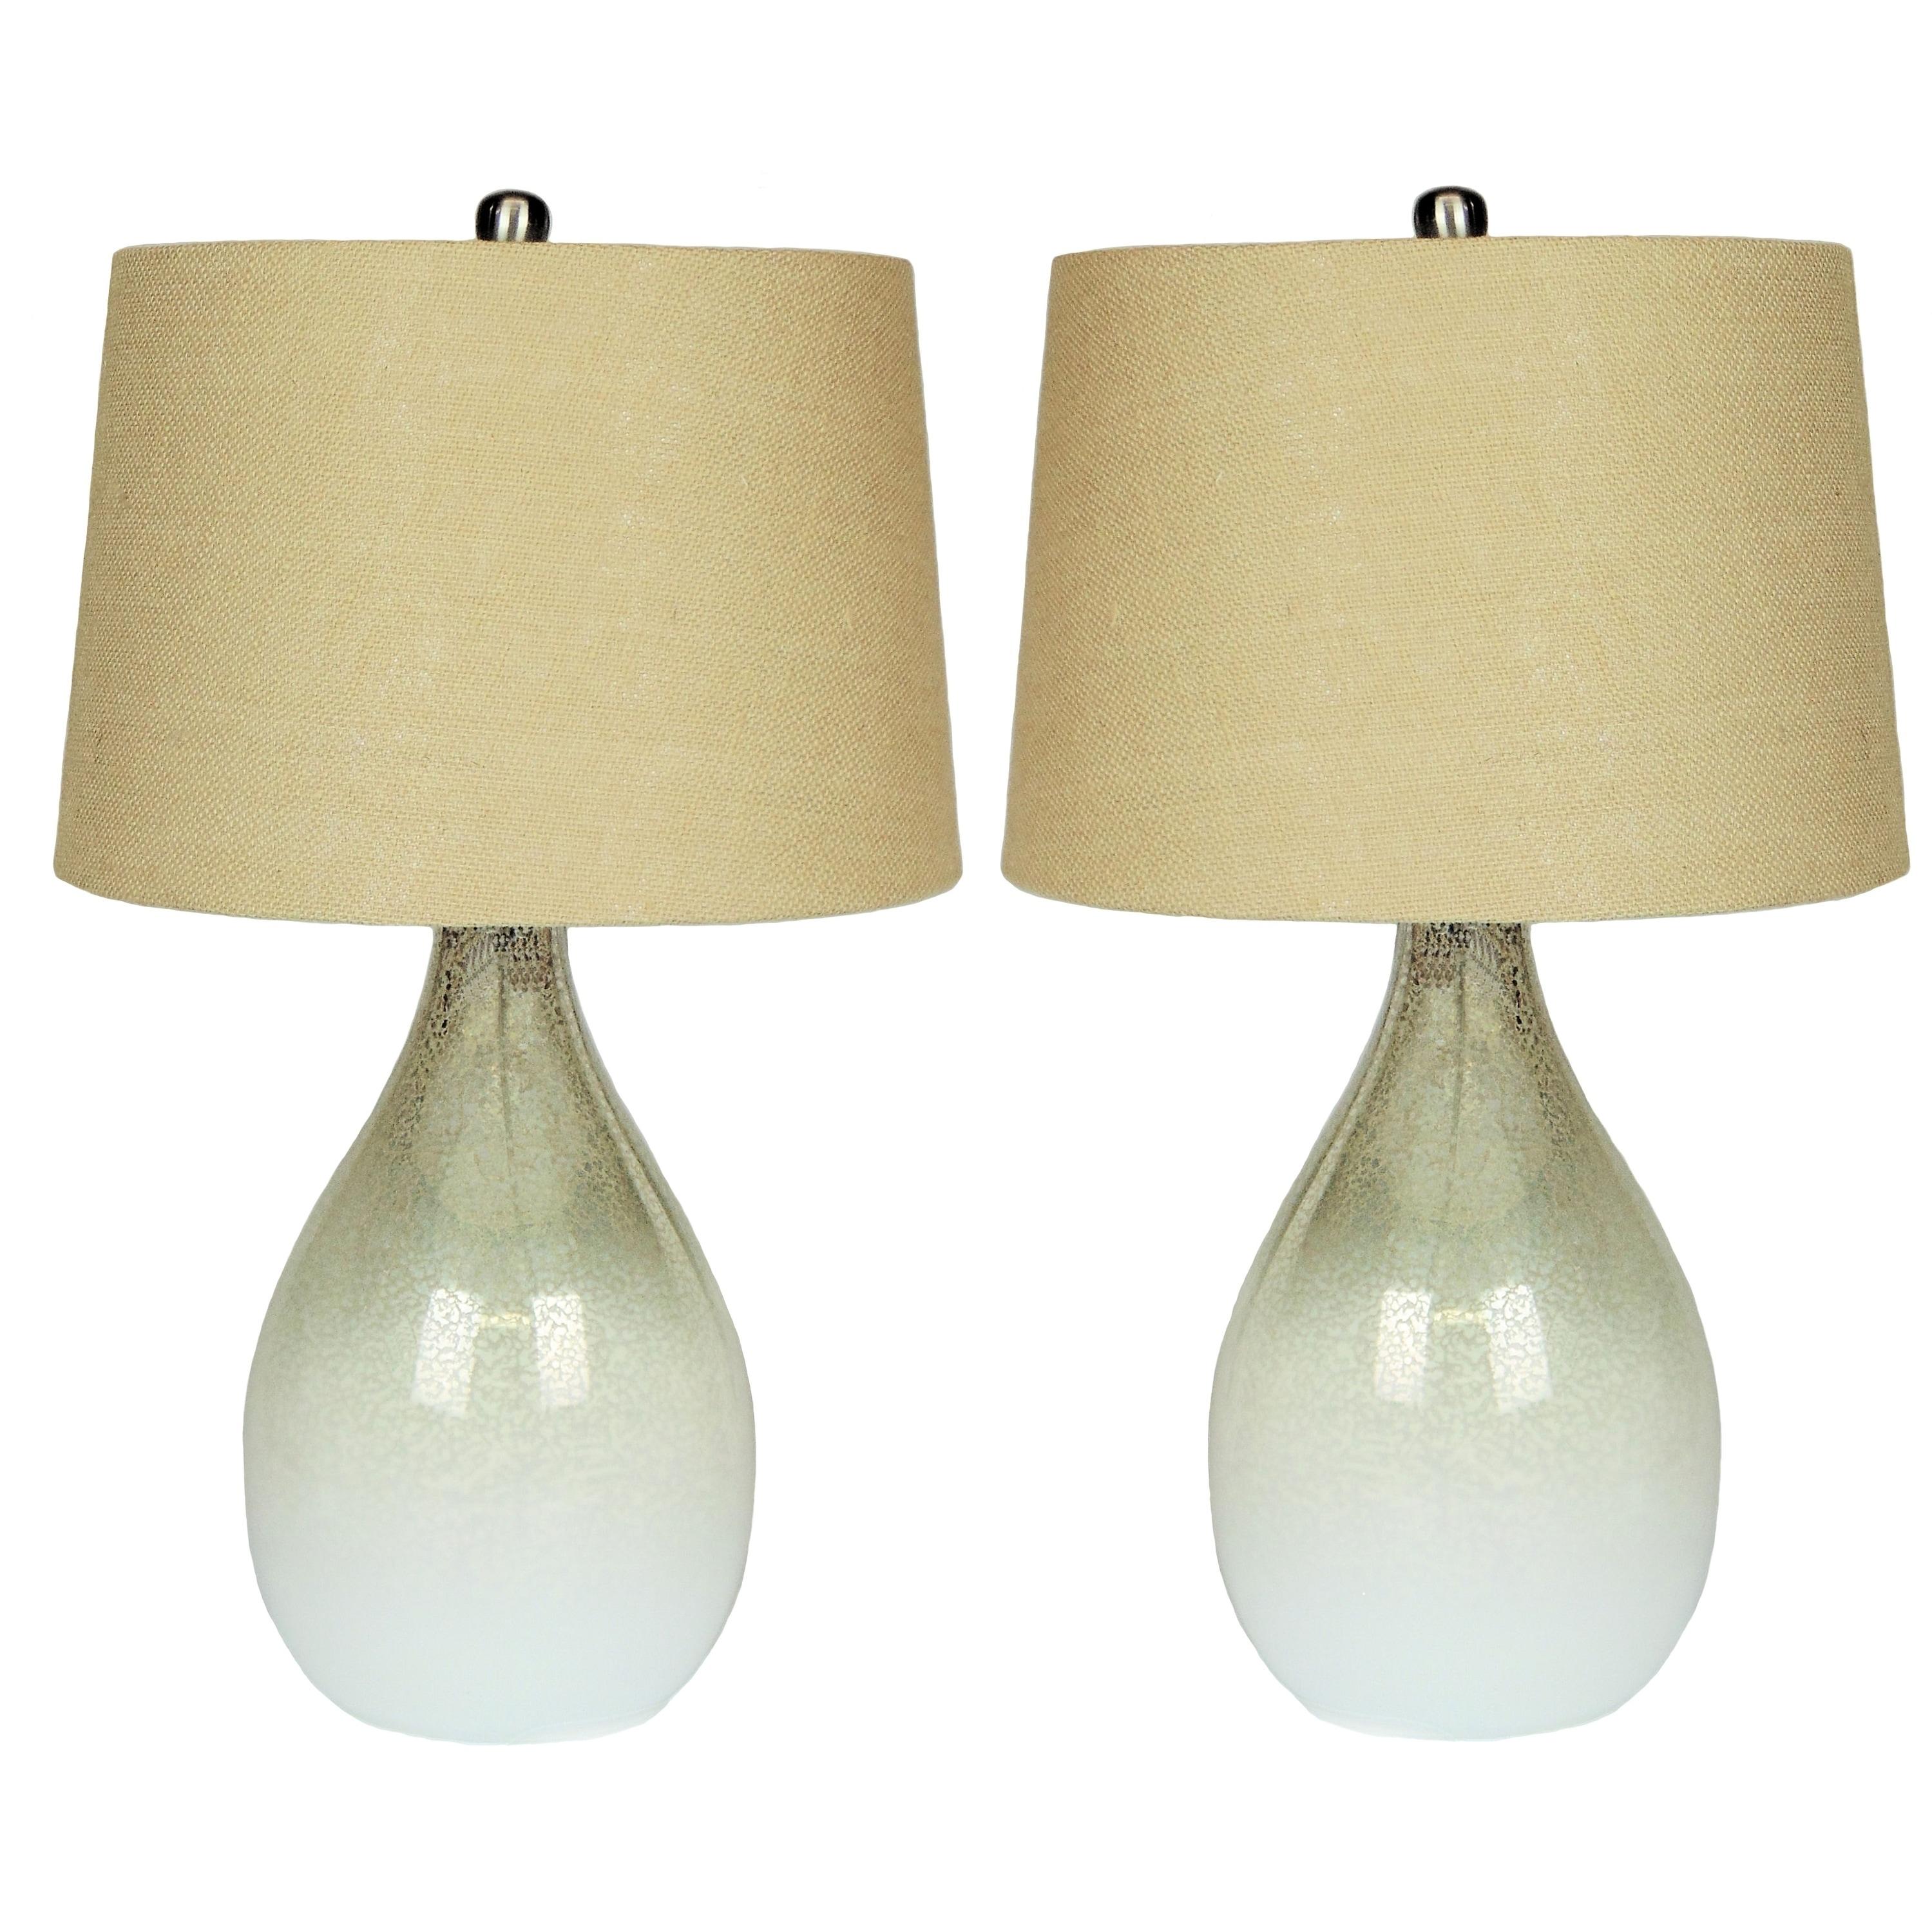 Shop Daliana Set Of 2 Mercury Glass Table Lamp Set 24 Inches